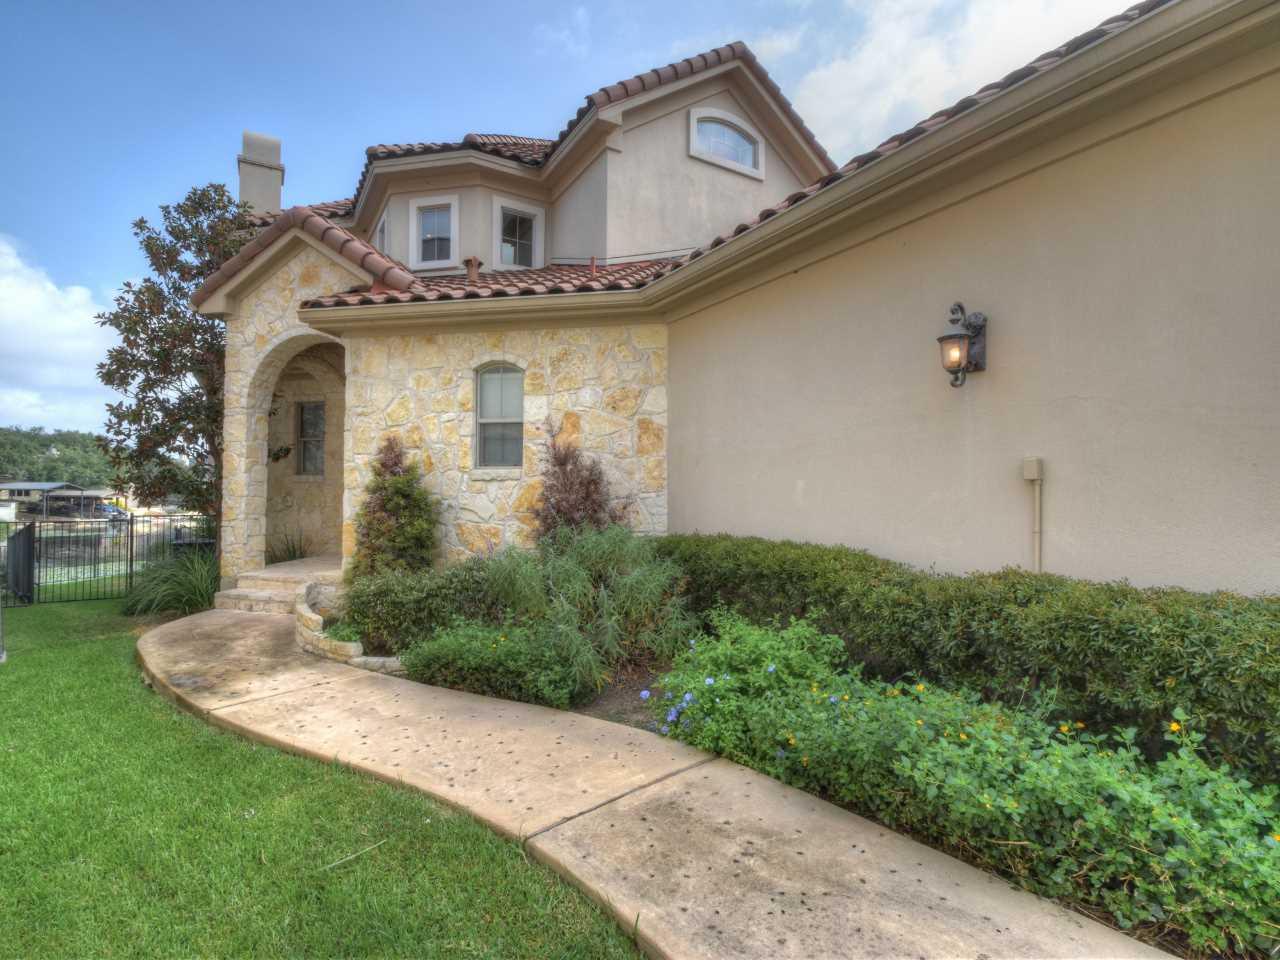 Single Family Home for Sale at 2518 Diagonal 2518 Diagonal Horseshoe Bay, Texas 78657 United States